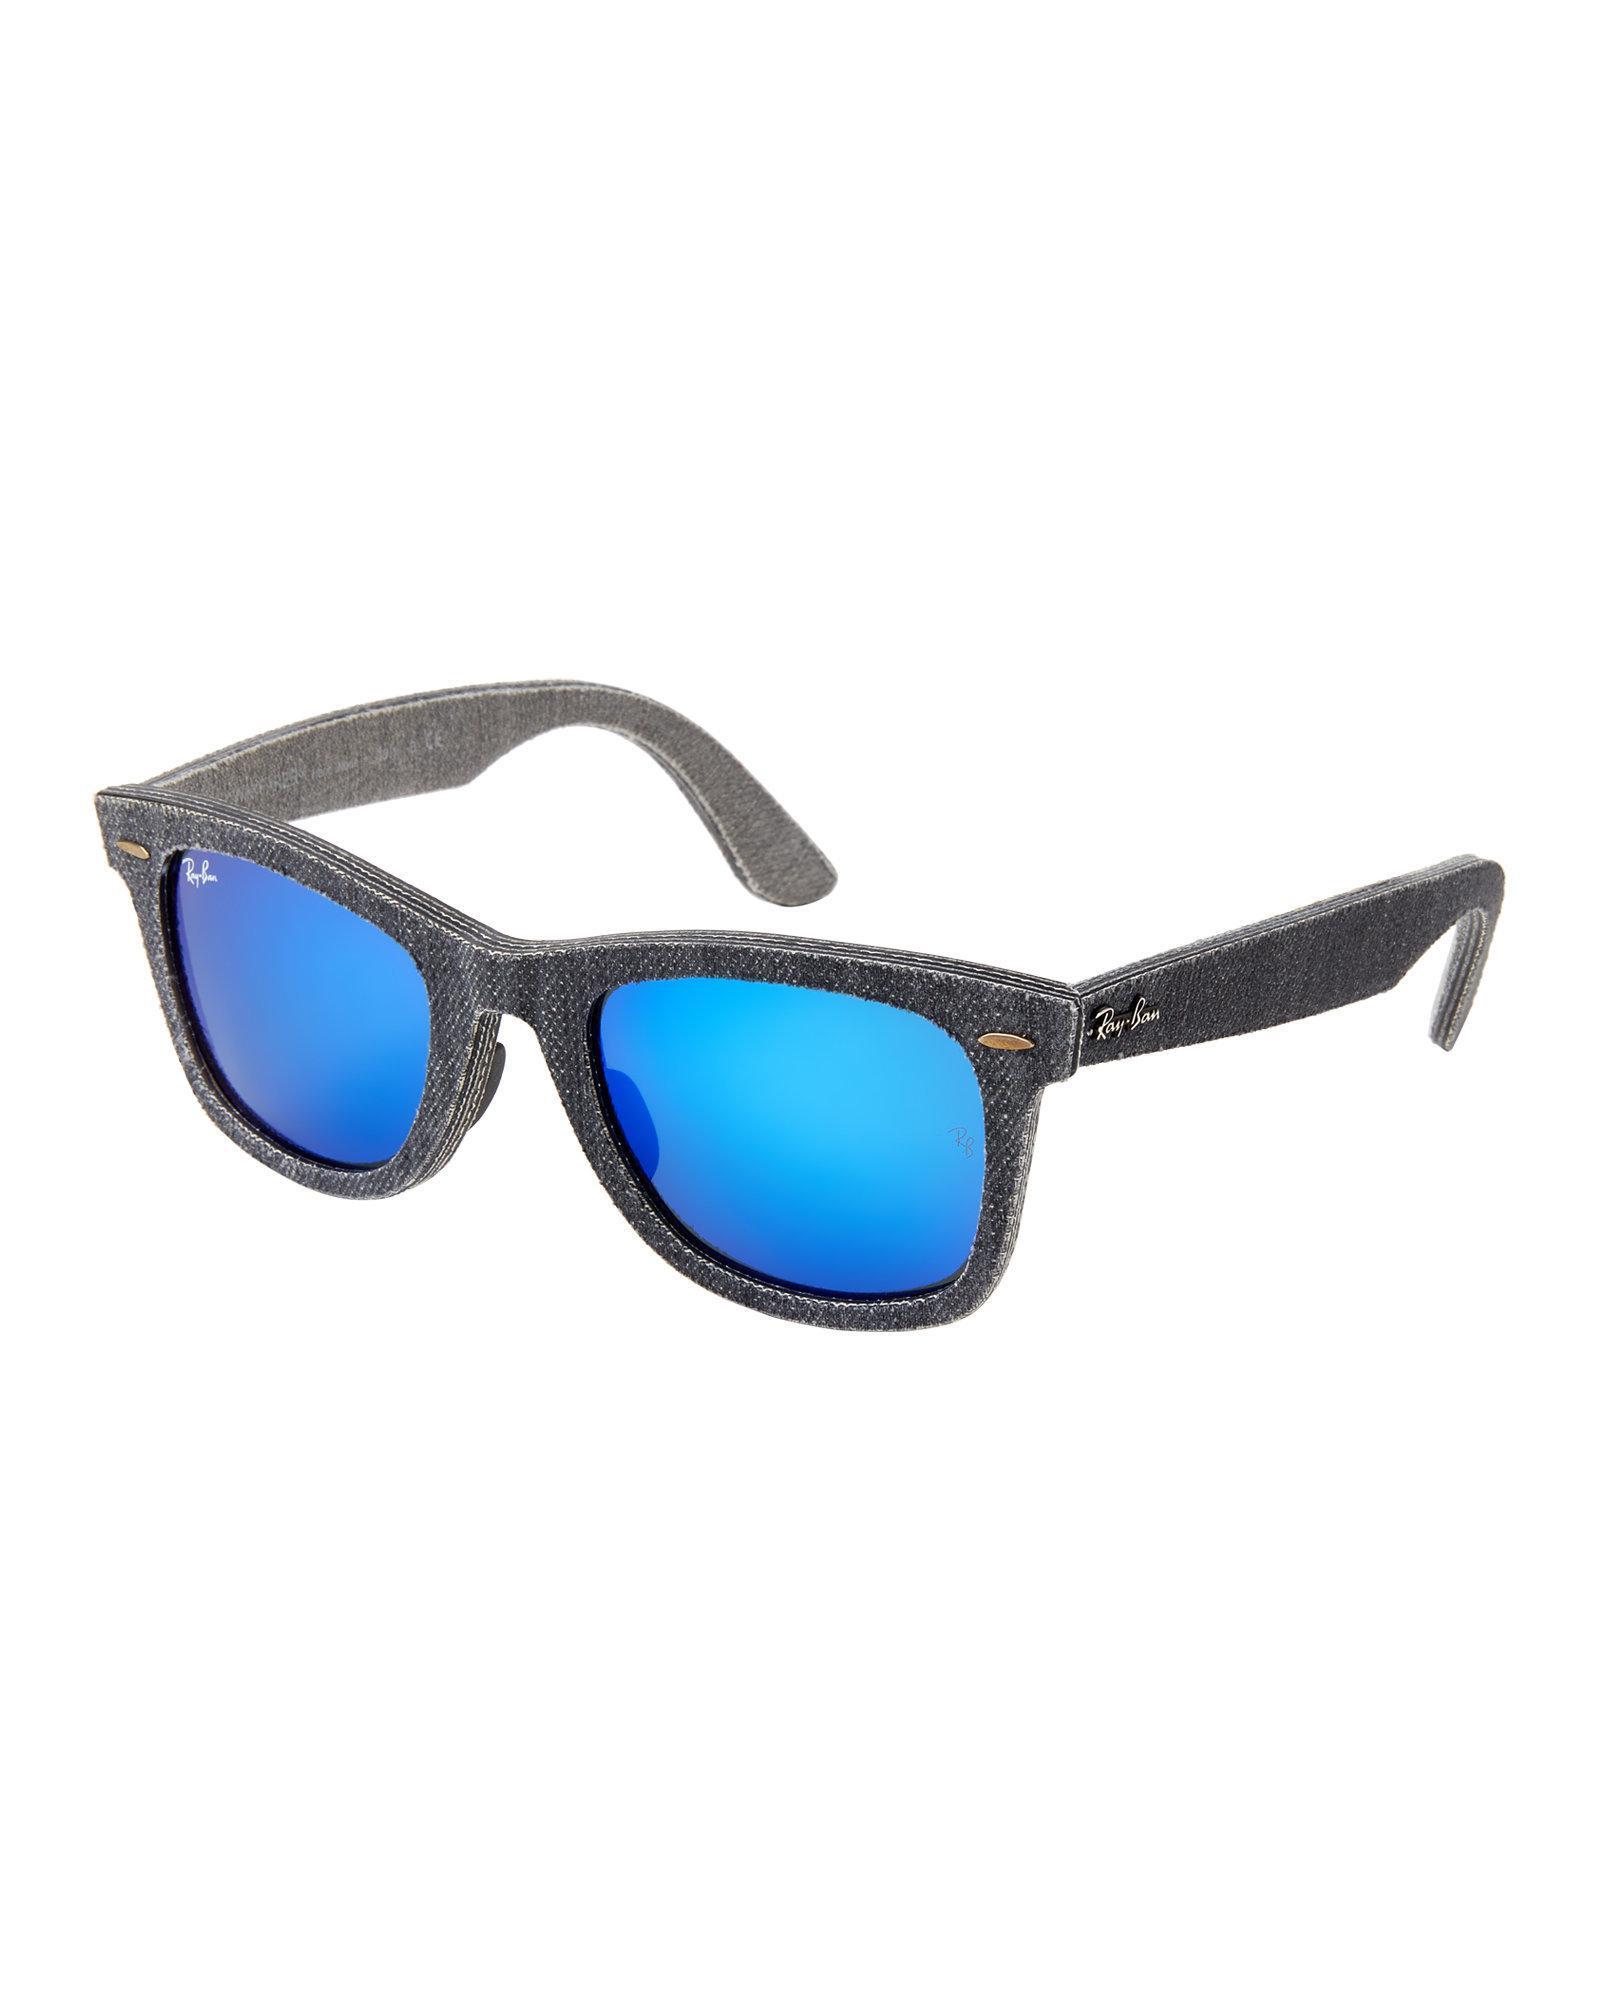 28325ce36b ... clearance ray ban. mens blue rb2140 grey denim wayfarer sunglasses  a9952 401bd